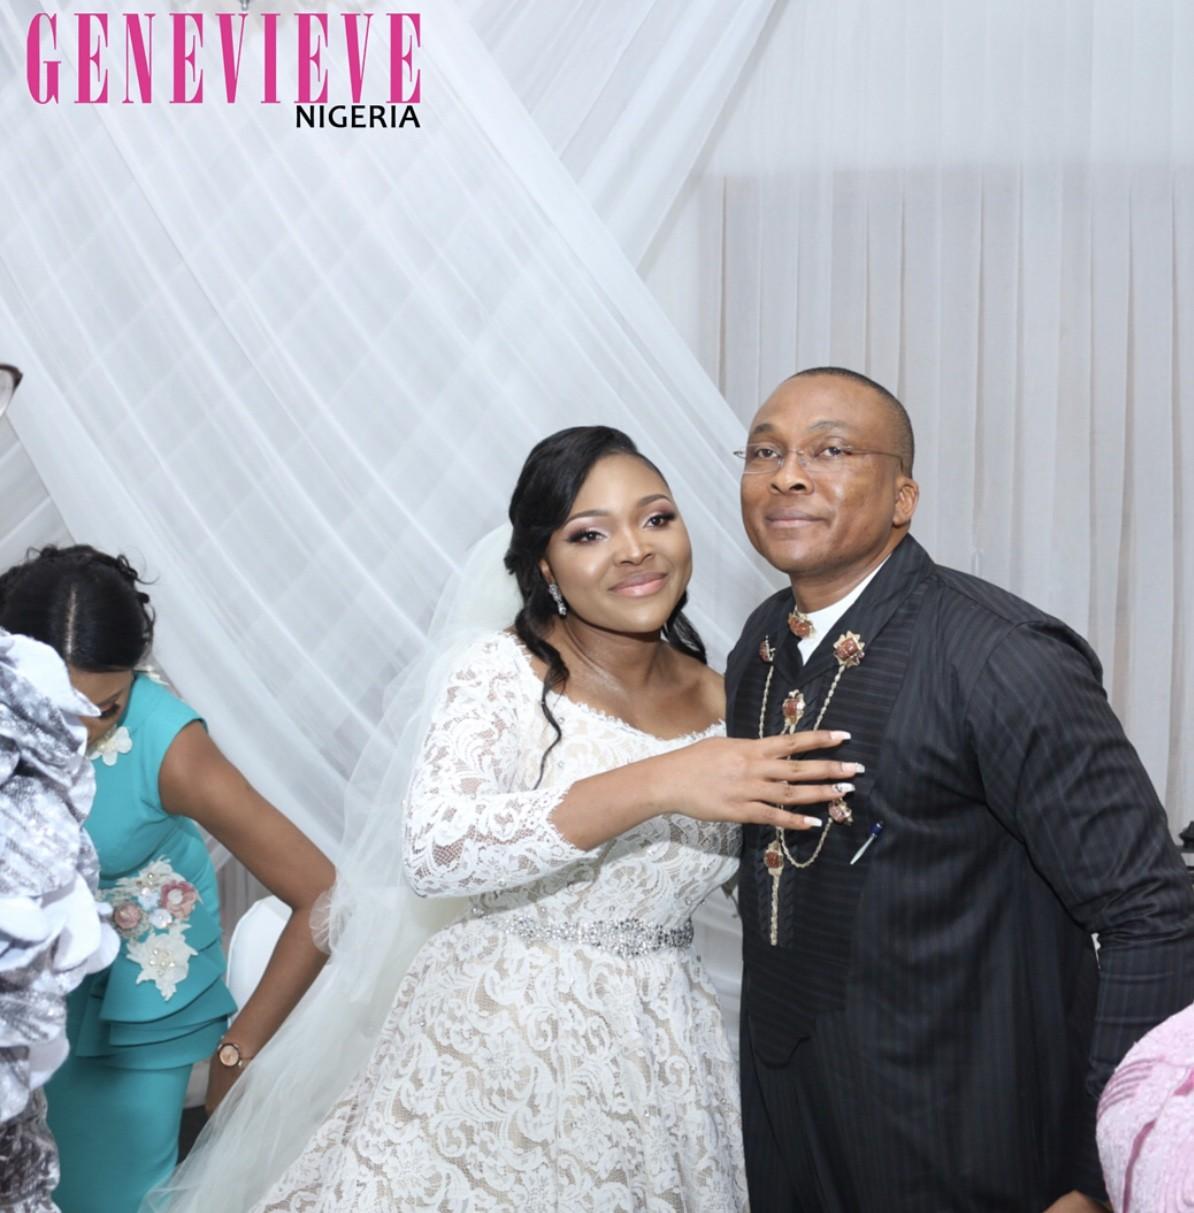 Photos from the white wedding of Joke Silva & Olu Jacobs